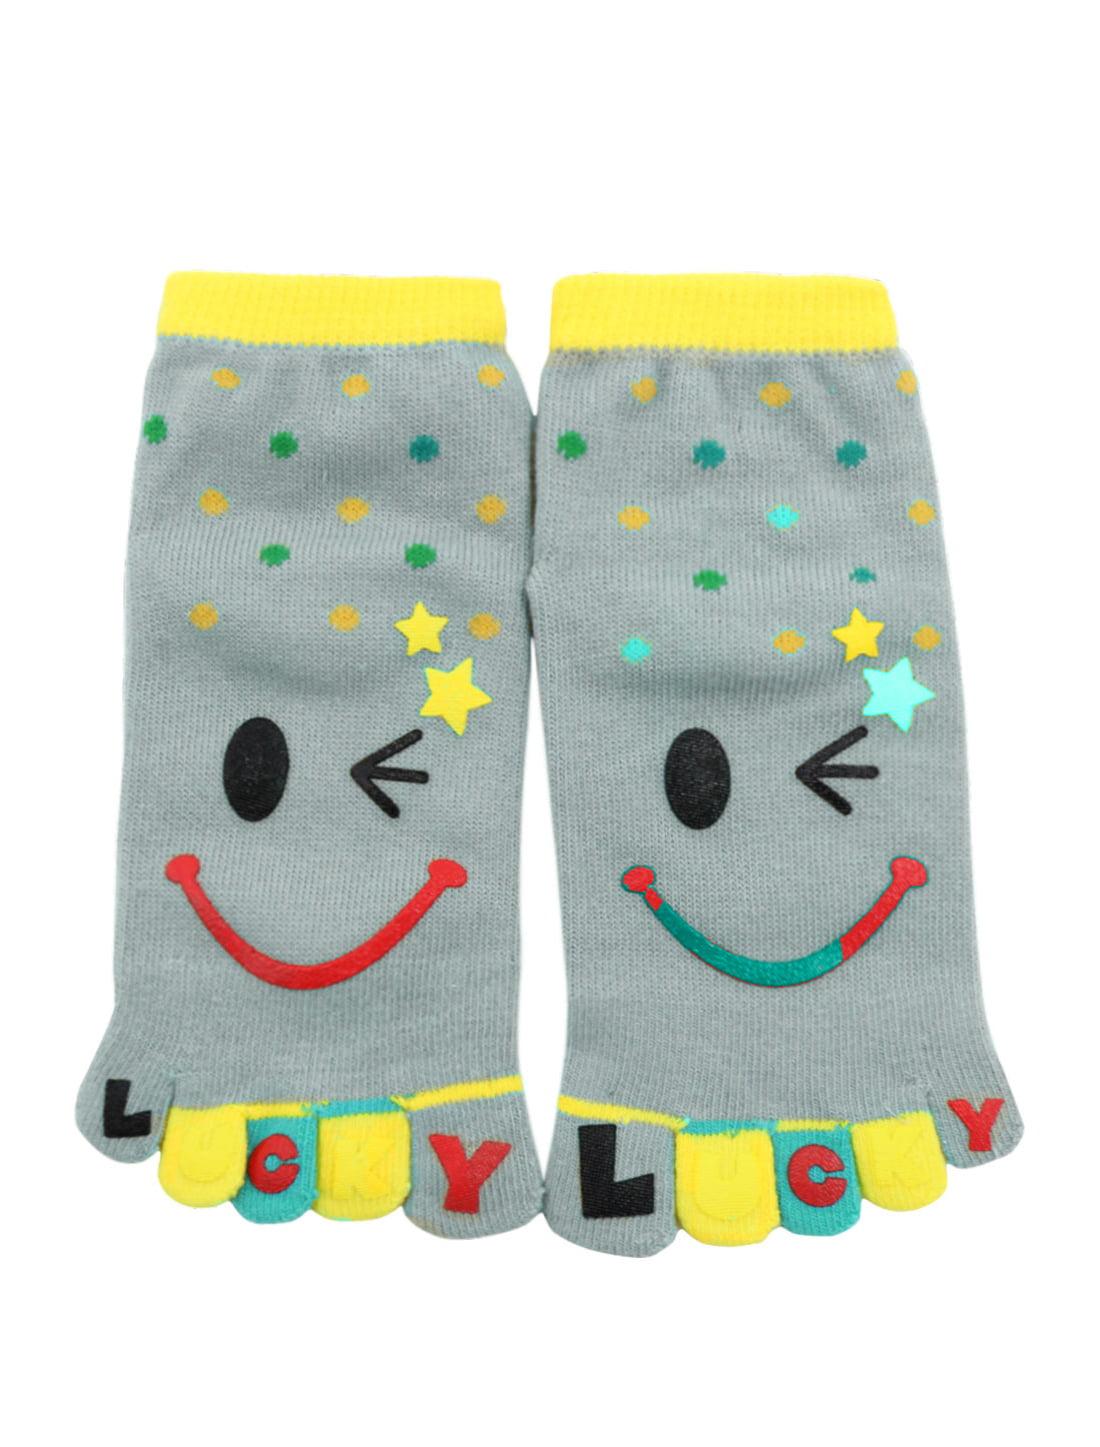 's Dots Pattern Stretchy Ankle Length Toe Socks Gray